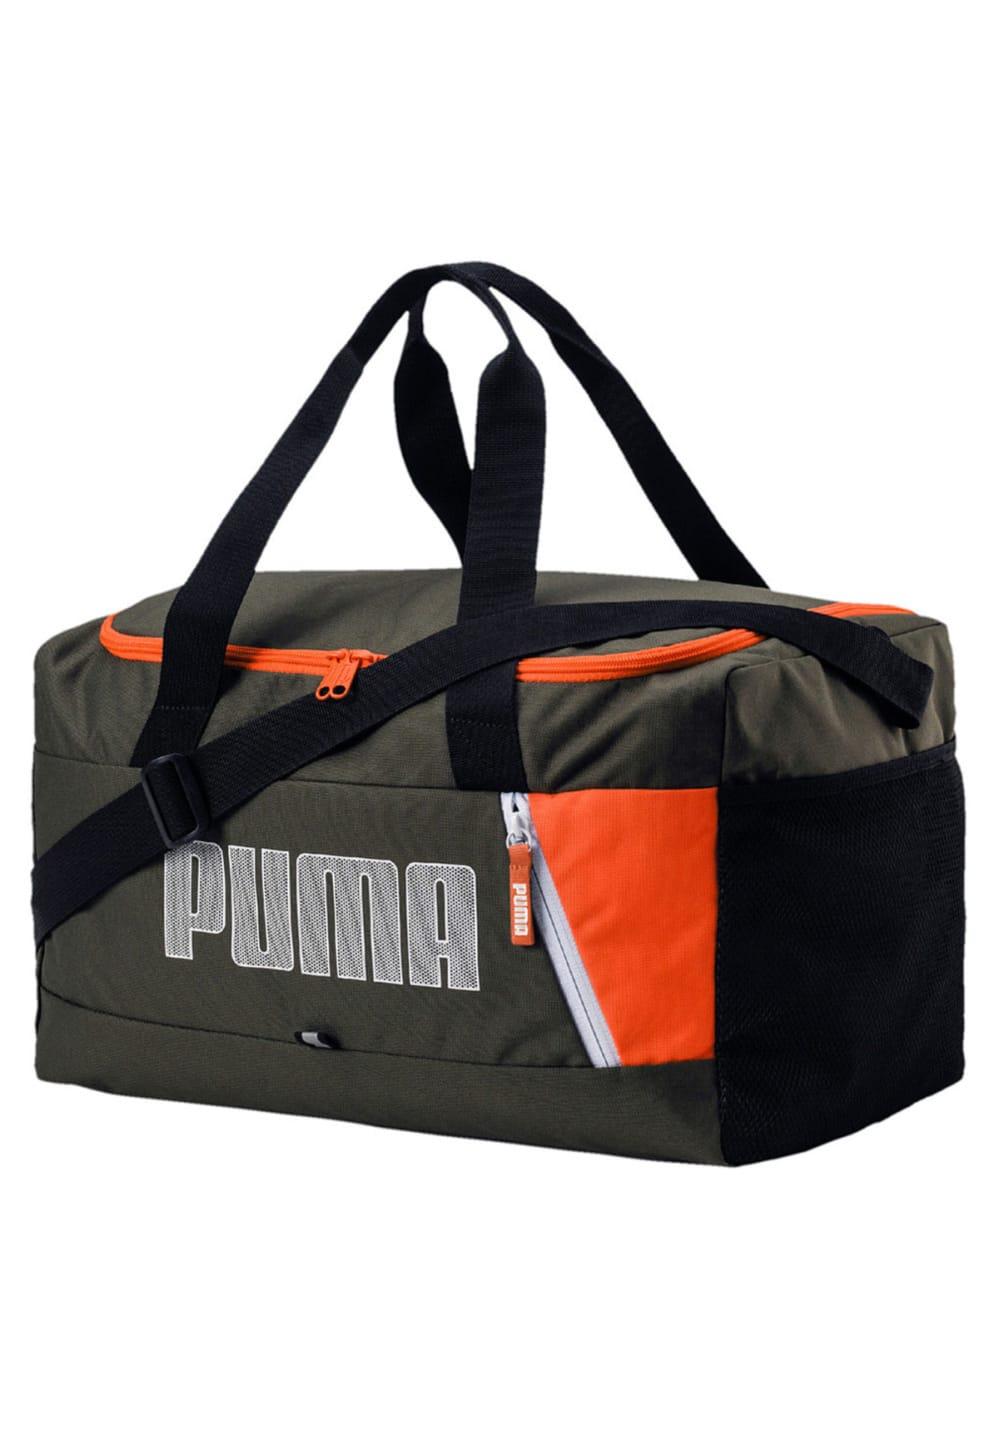 Gris21run Sport S Ii Puma Sports Sacs Fundamentals Bag NOy0vwm8Pn